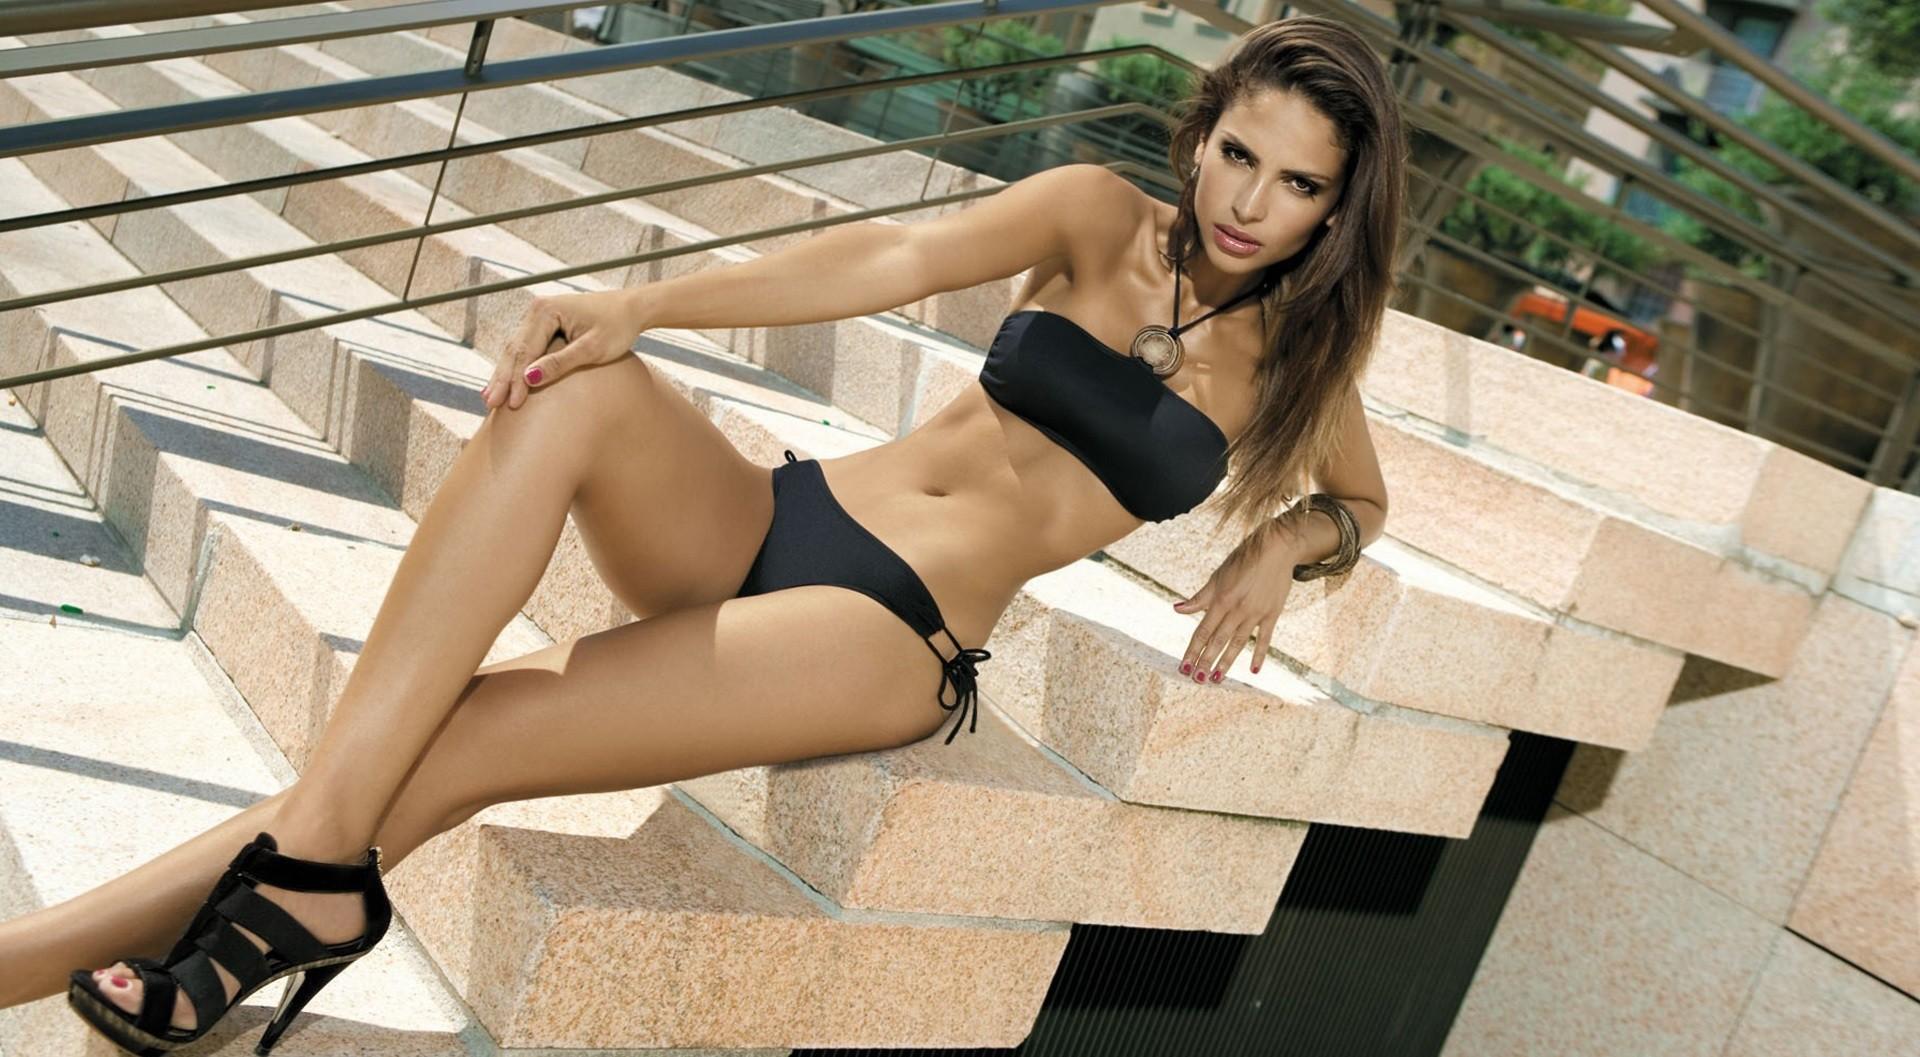 Girls in bikinis and high heels — 4